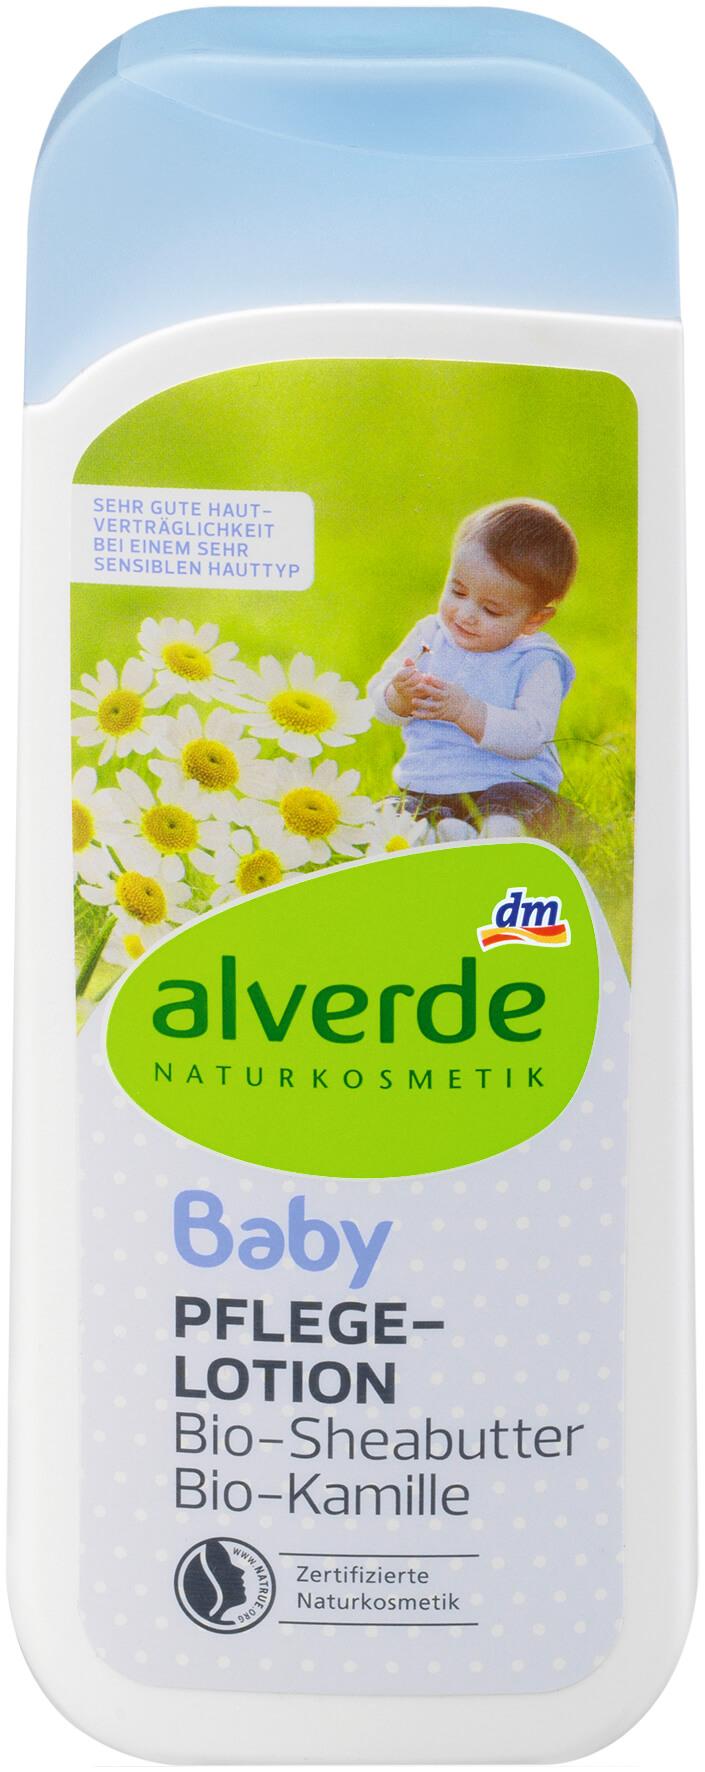 Produktrueckruf Alverde Baby Pflegelotion Bio Sheabutter Bio Kamille